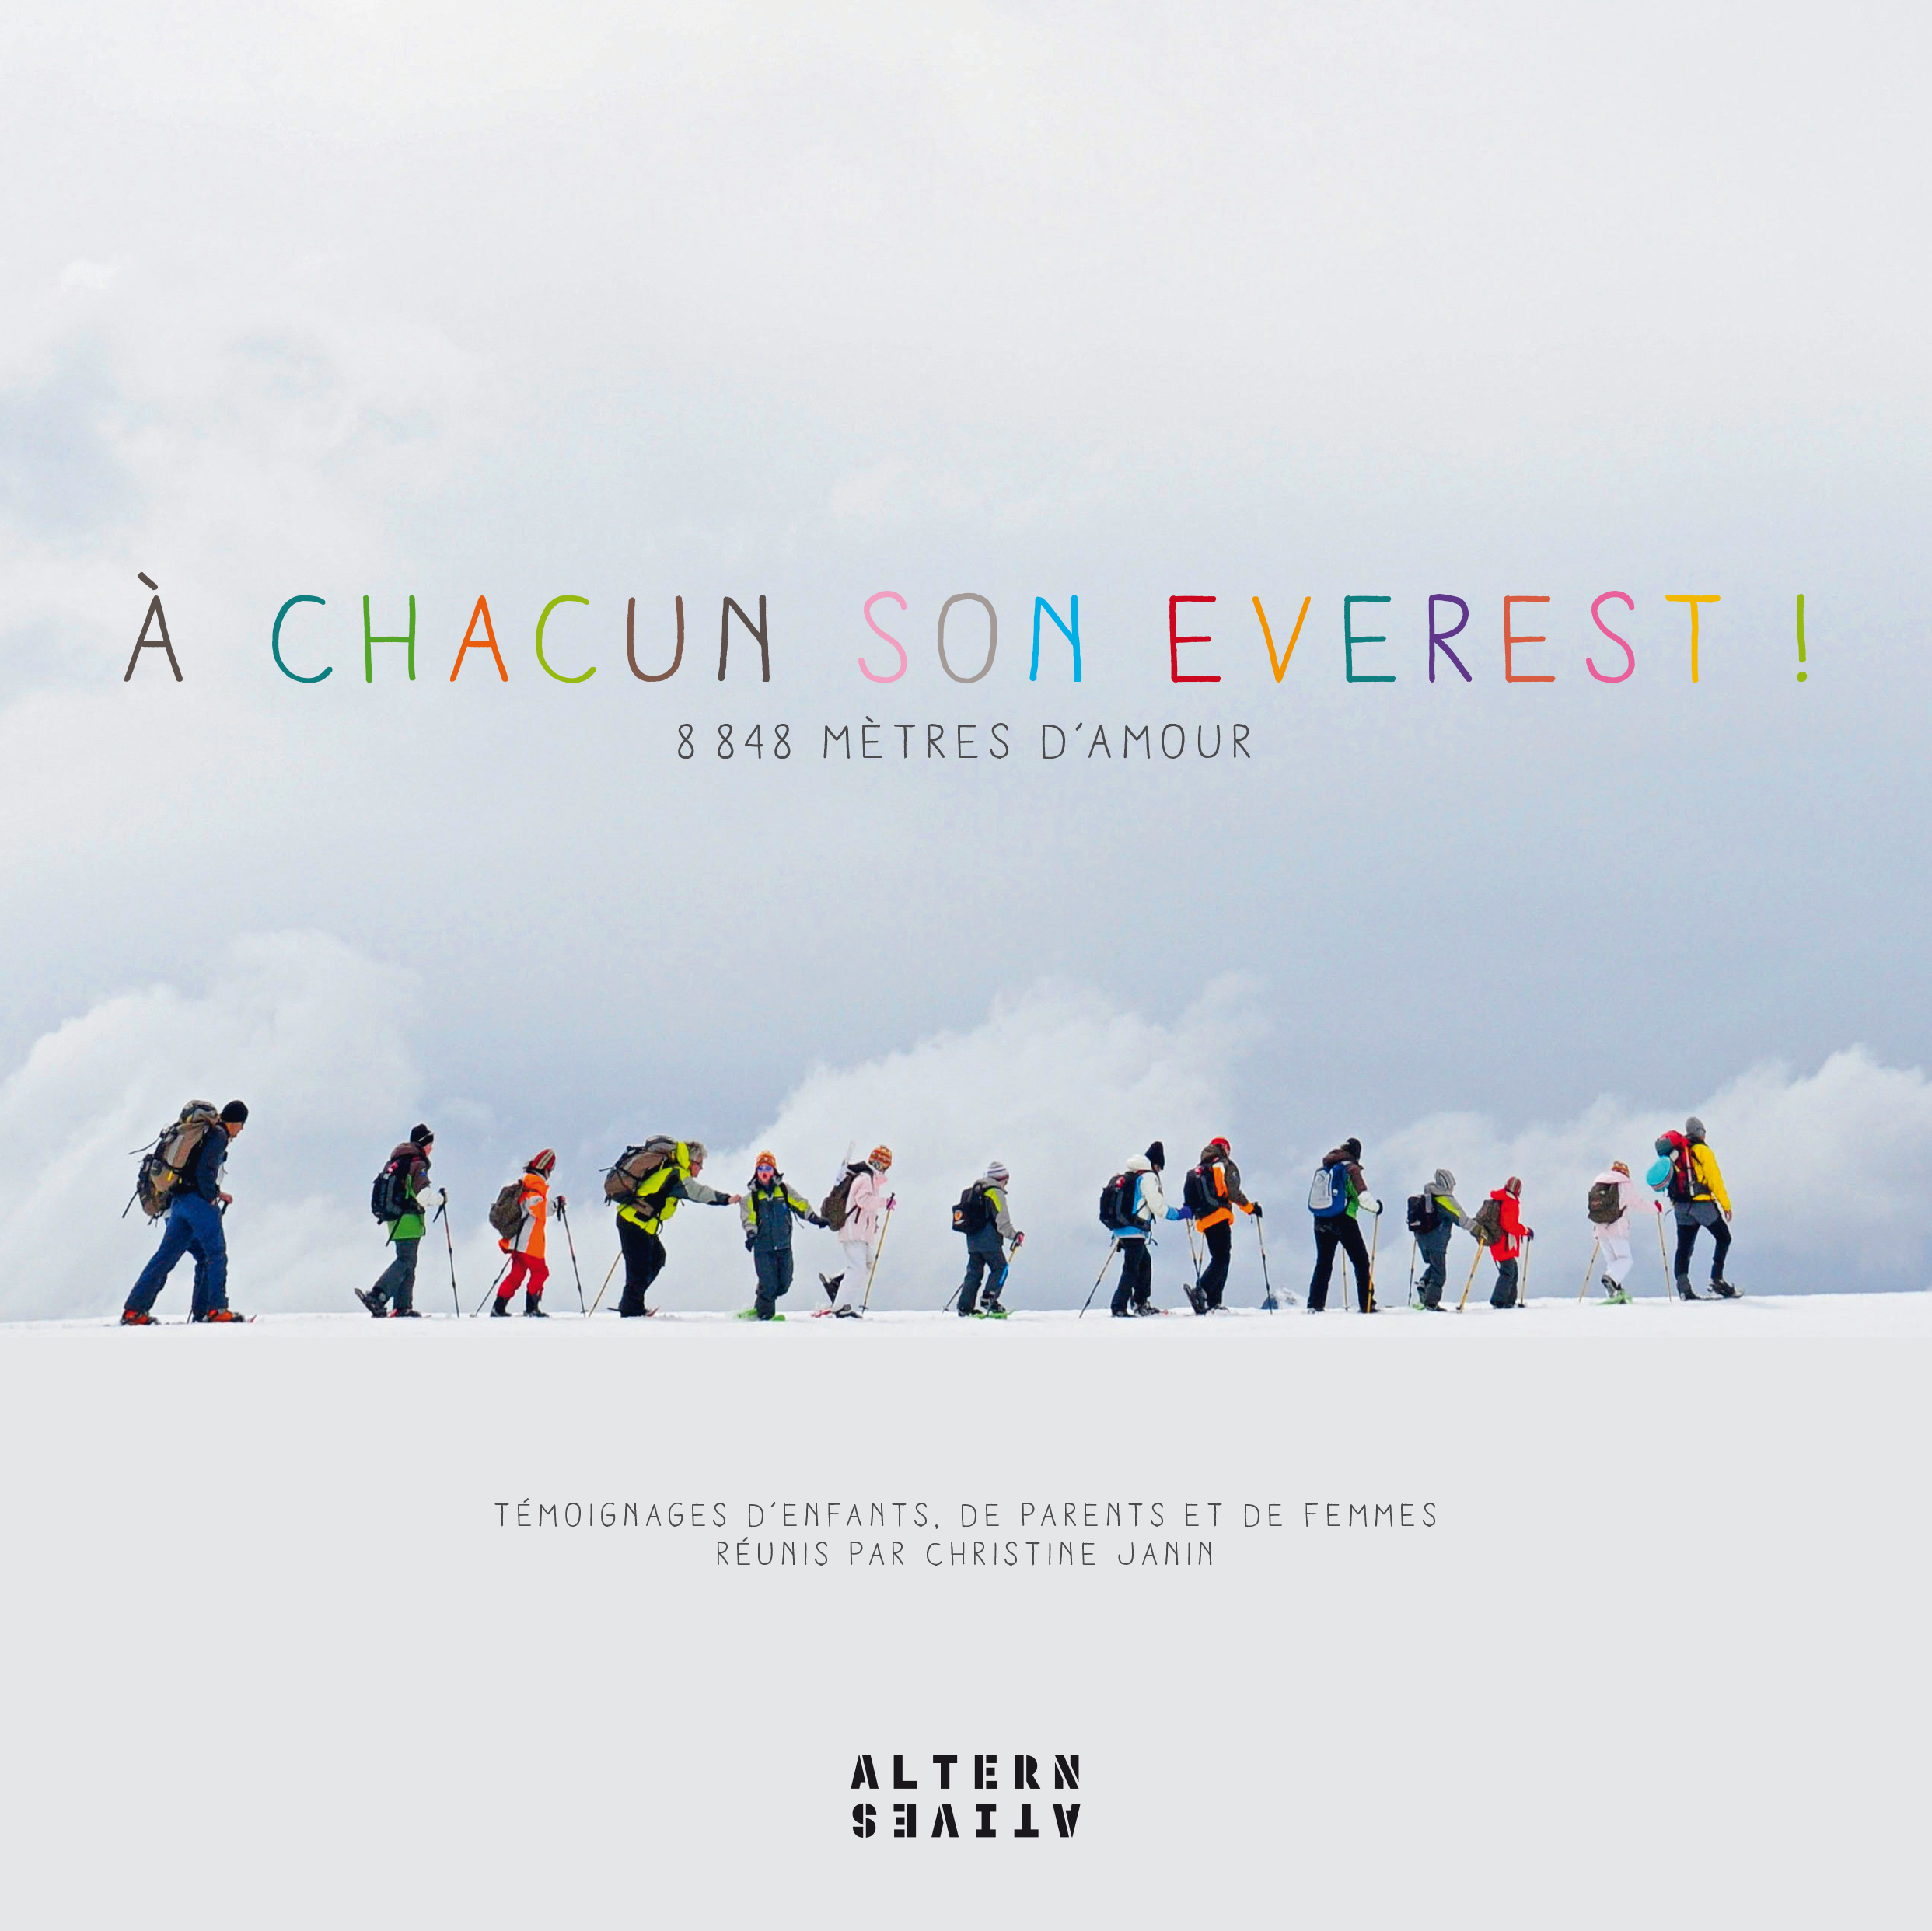 A CHACUN SON EVEREST ! - 8 848 METRES D'AMOUR